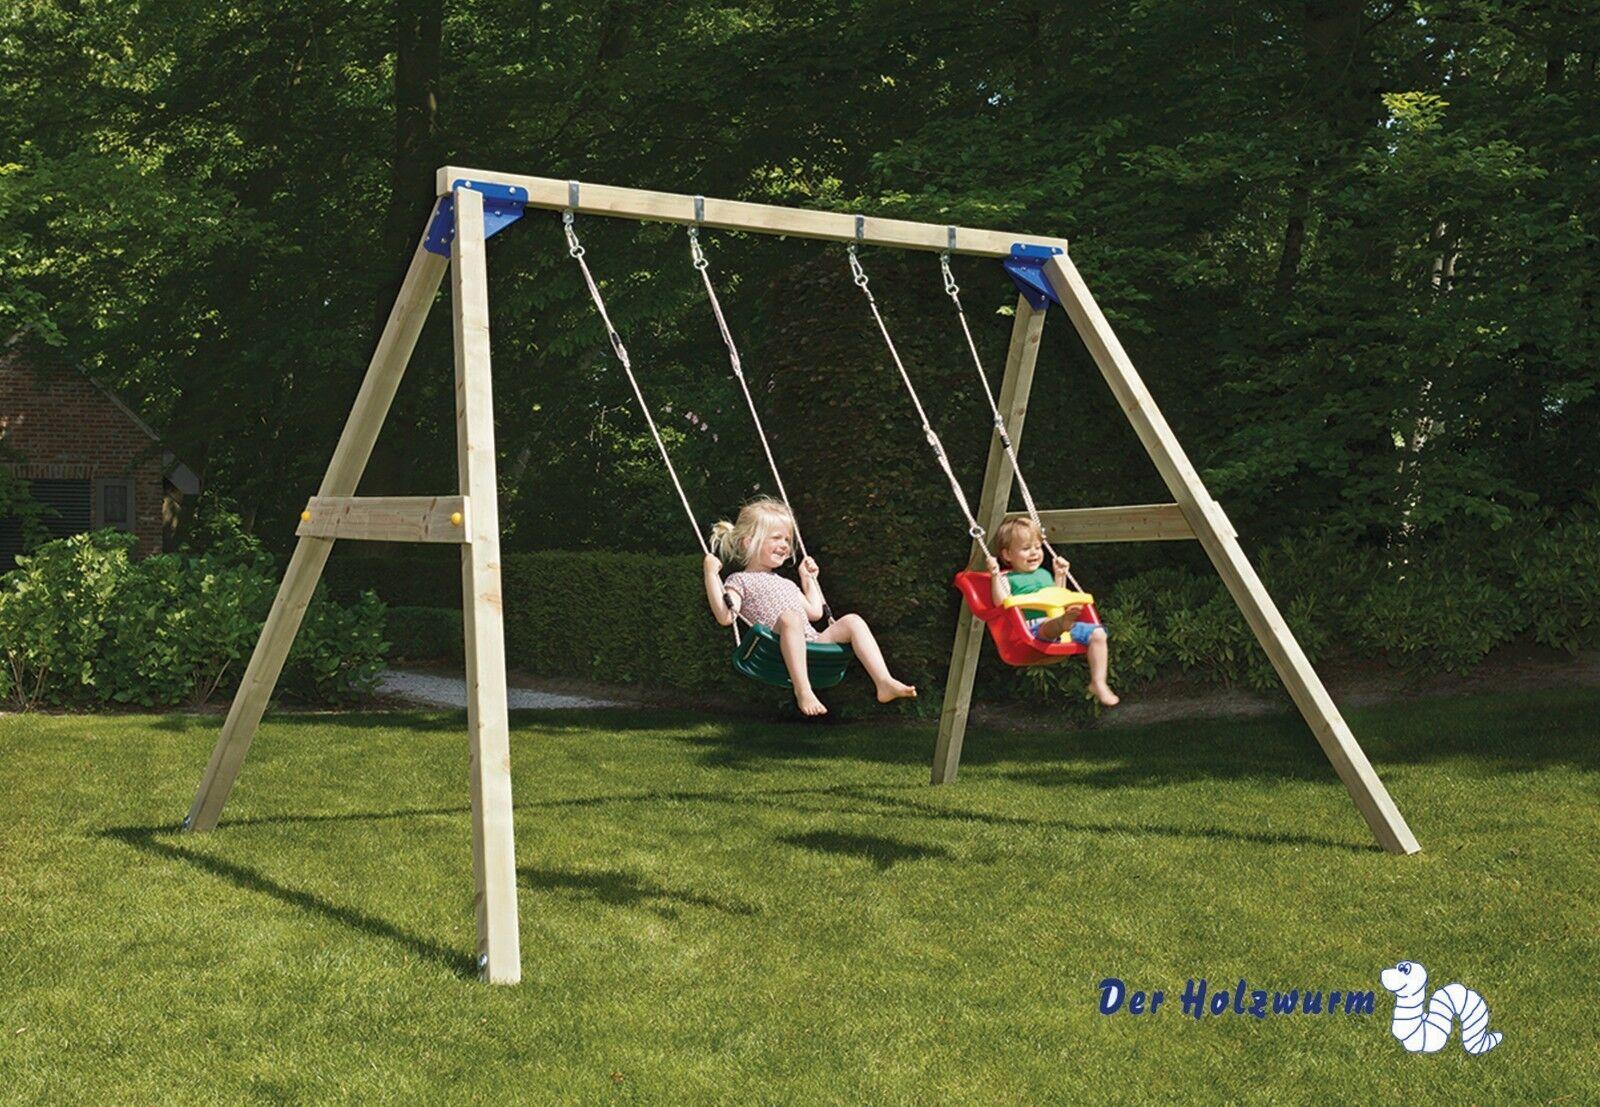 Kinderspielturm Blau Rabbit Freeswing Freeswing Freeswing ca 360x280 cm Kinderspielanlage Spielgerät 75c9b5